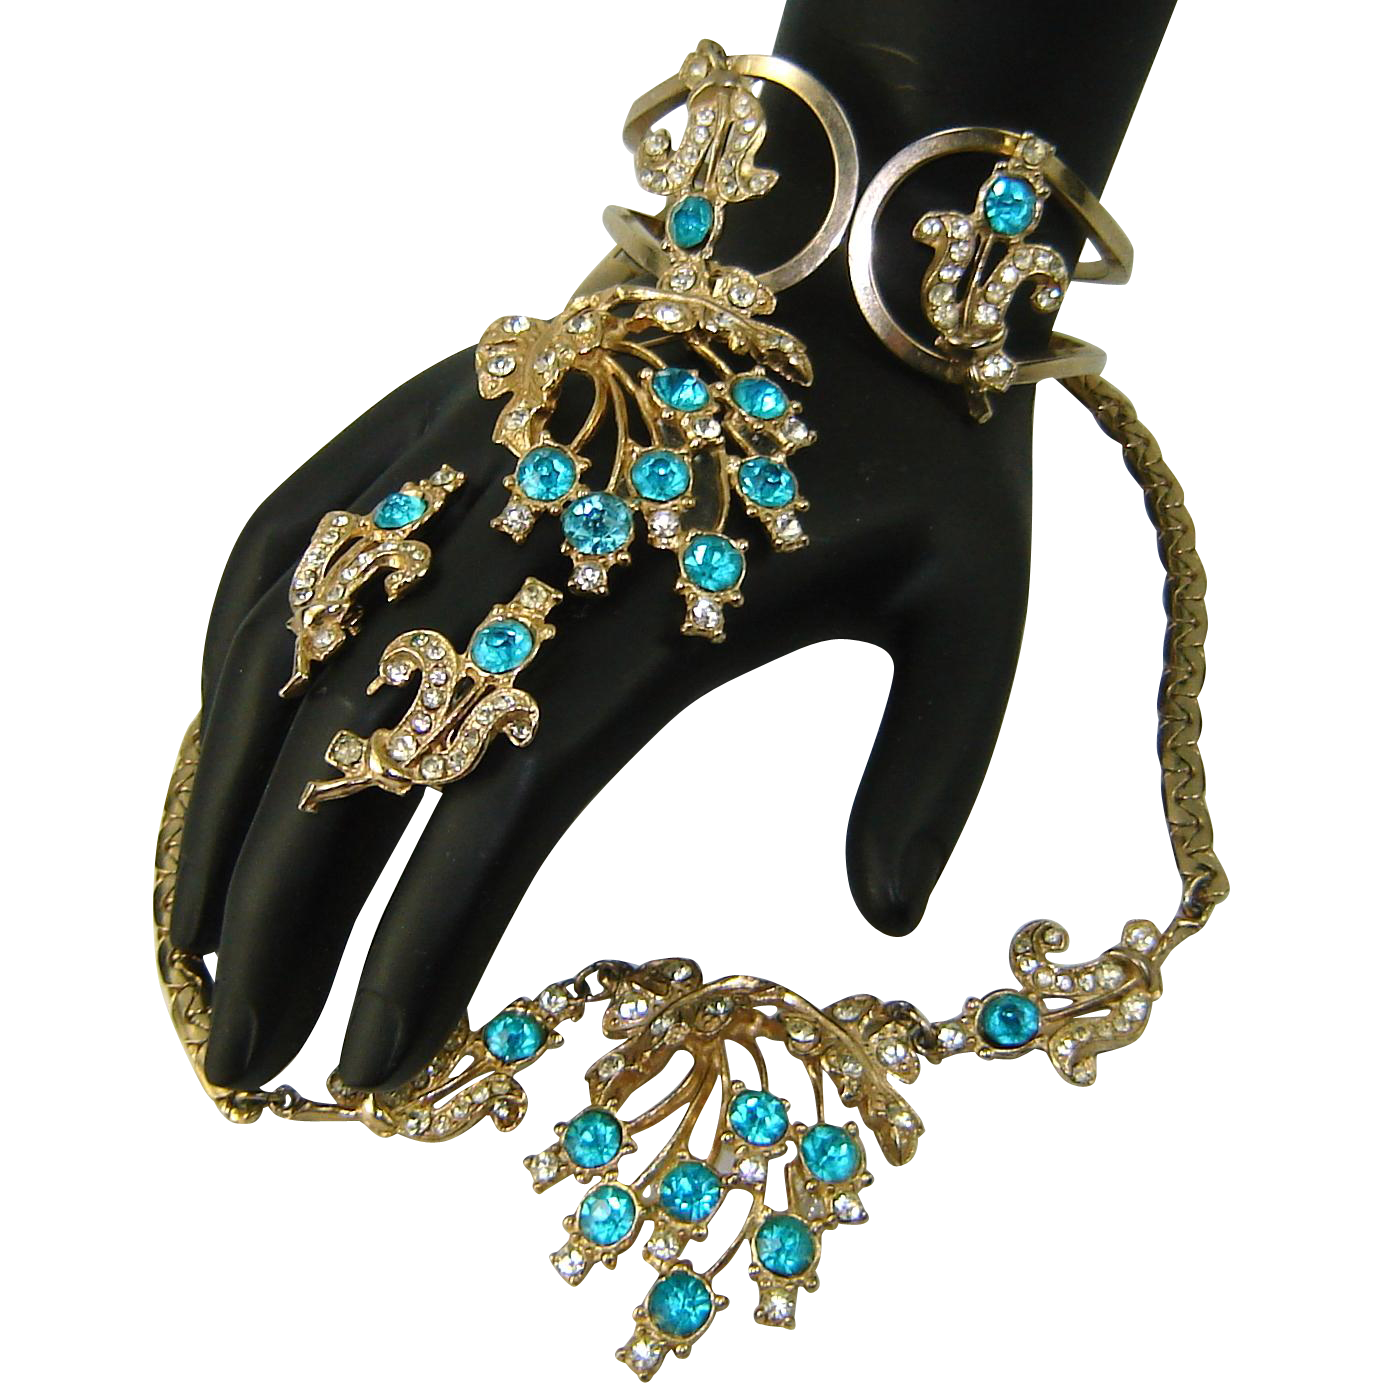 Vintage OLEG CASSINI Necklace Bracelet Brooch Earrings Aqua Rhinestone 24K GP Parure